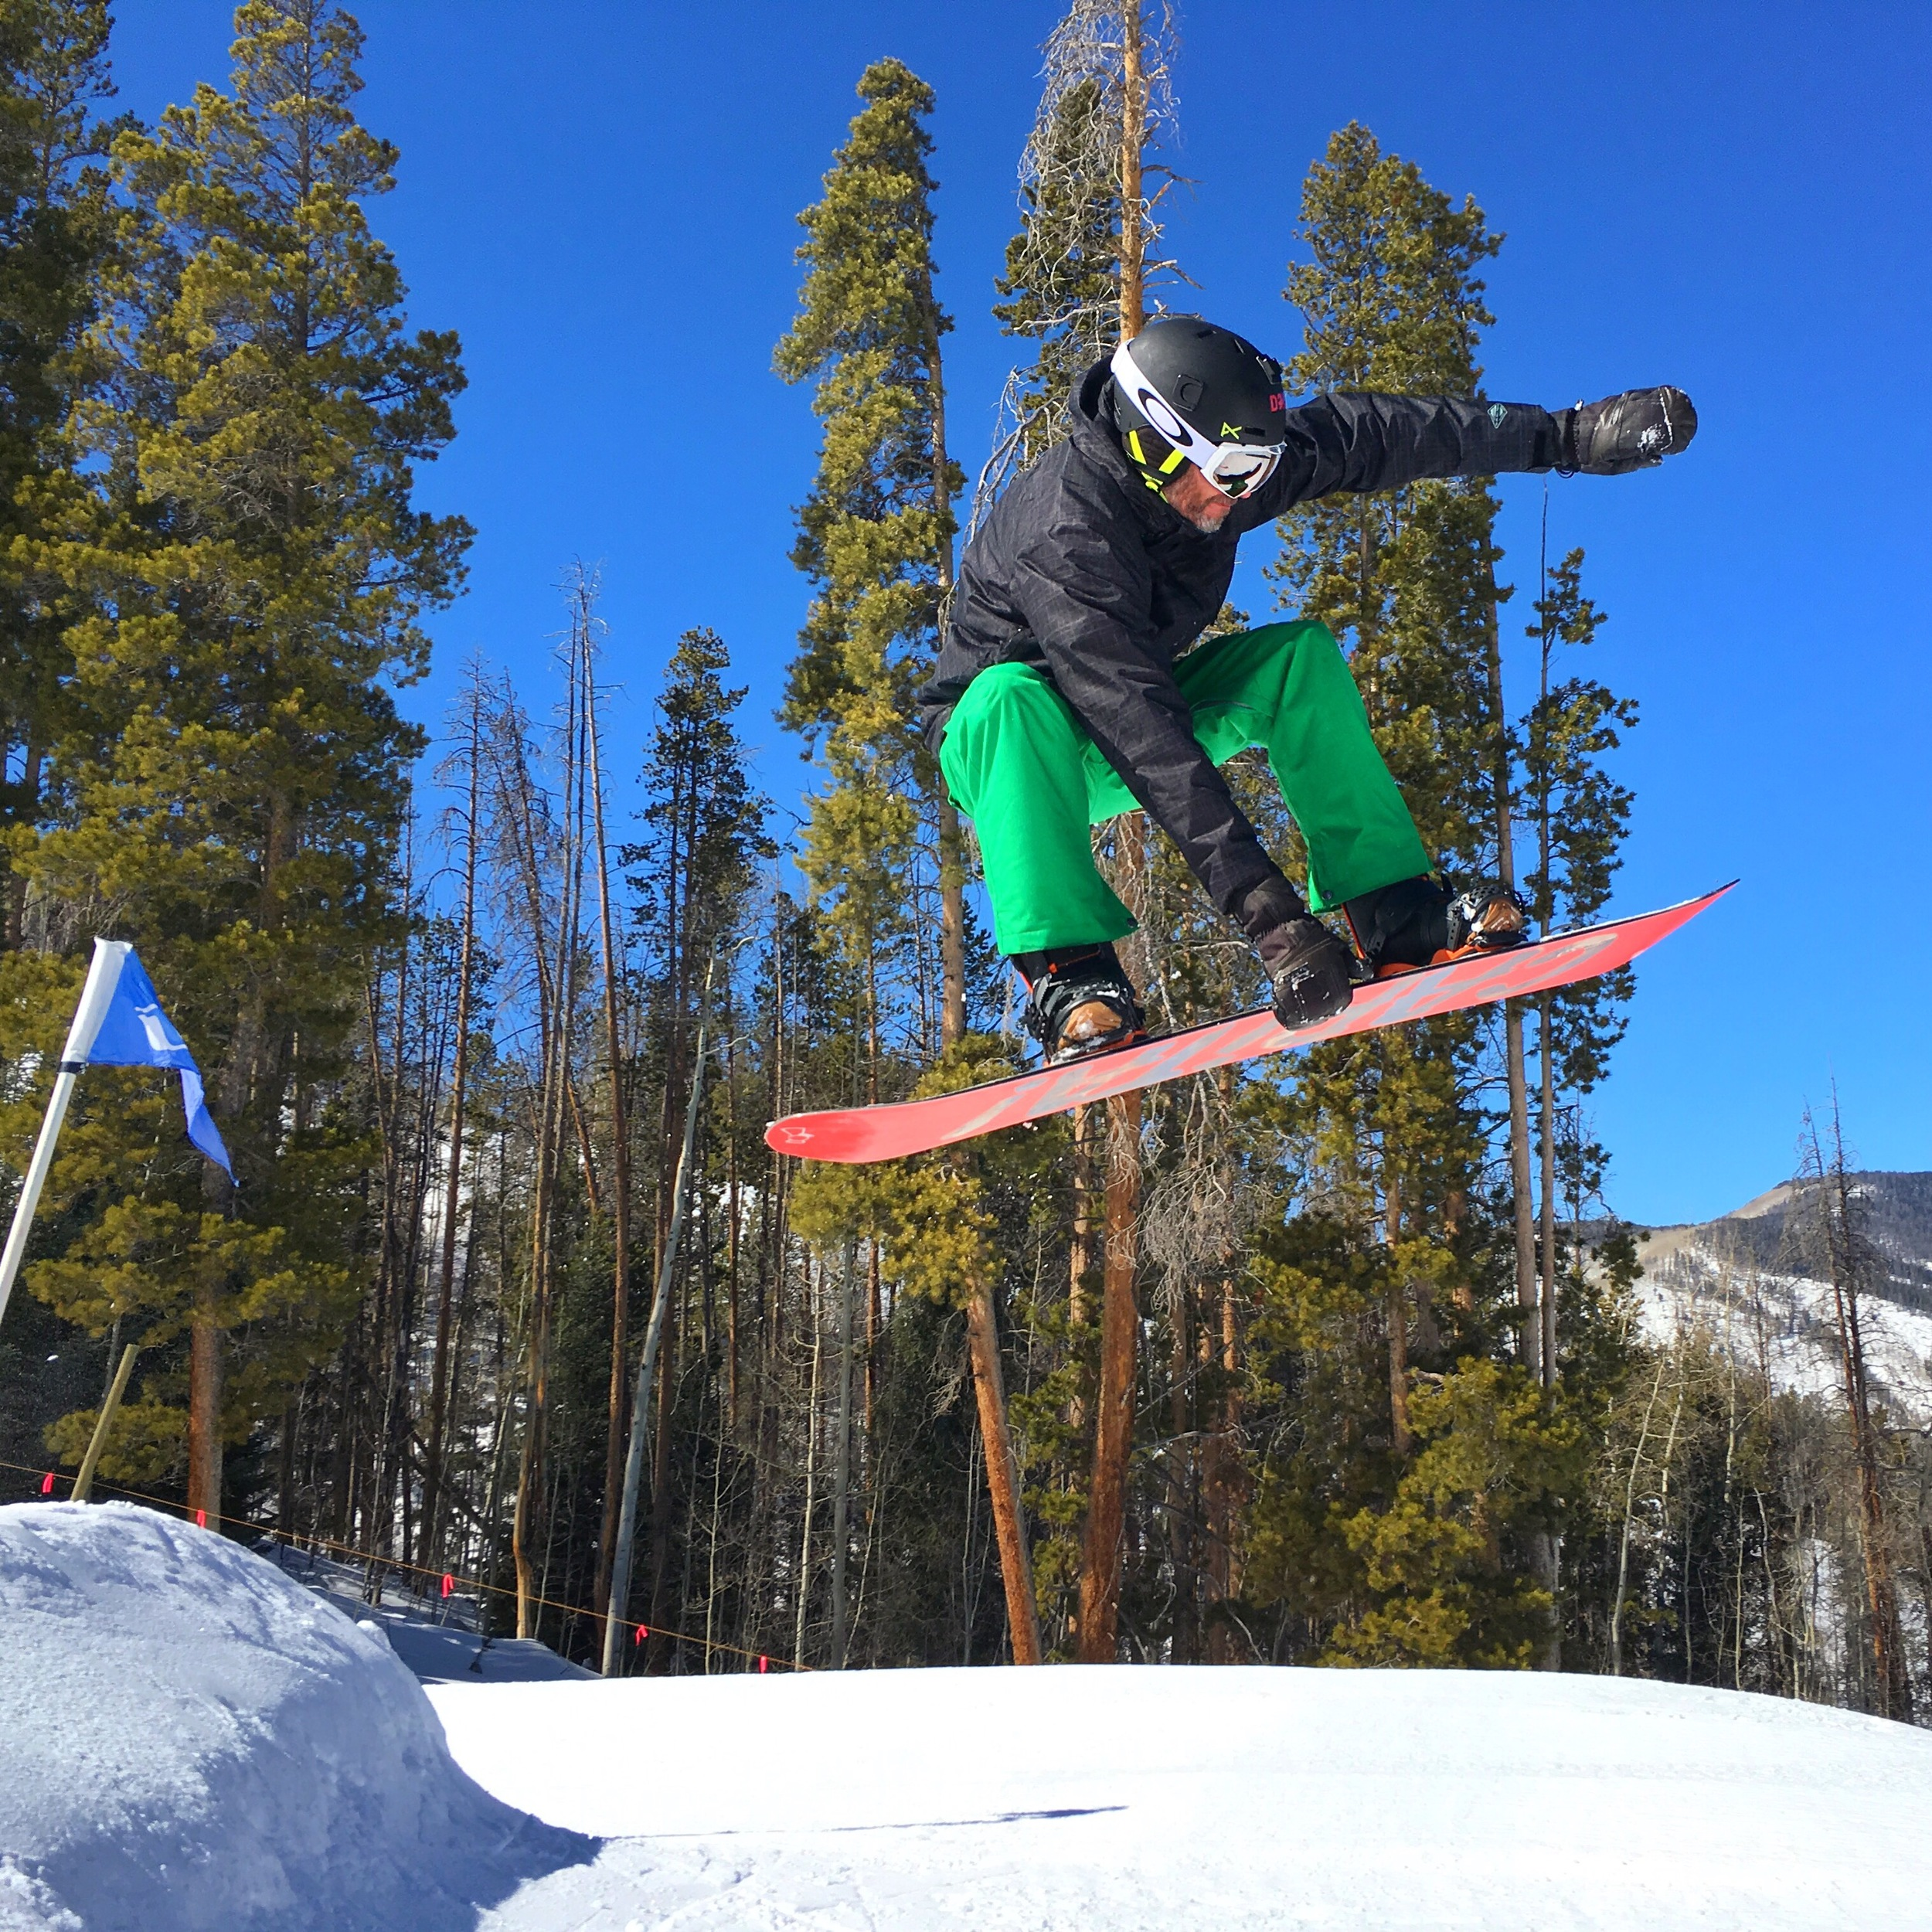 mick doing a snowboard jump